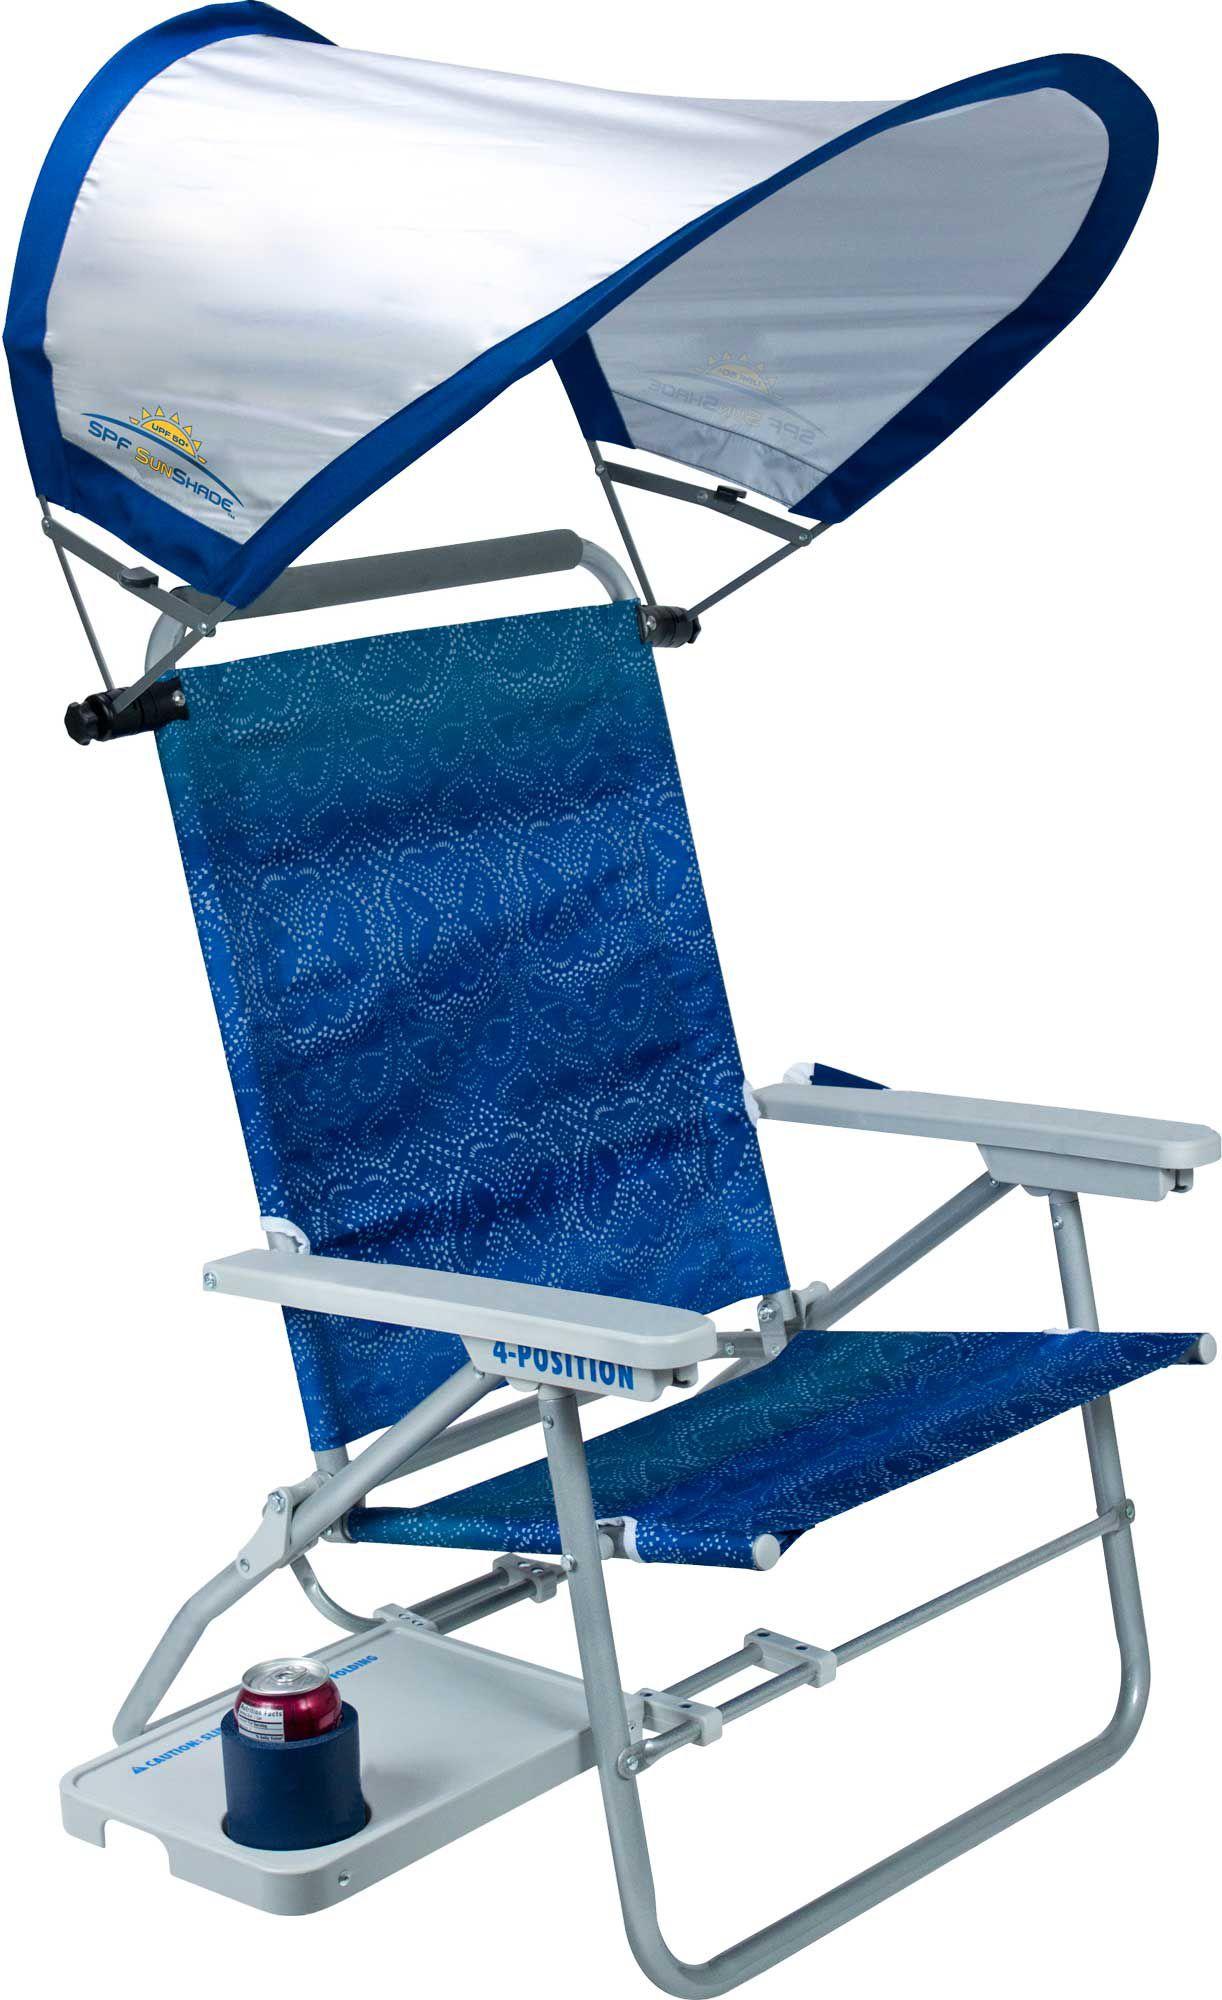 Beach Chairs Folding & Portable Chairs